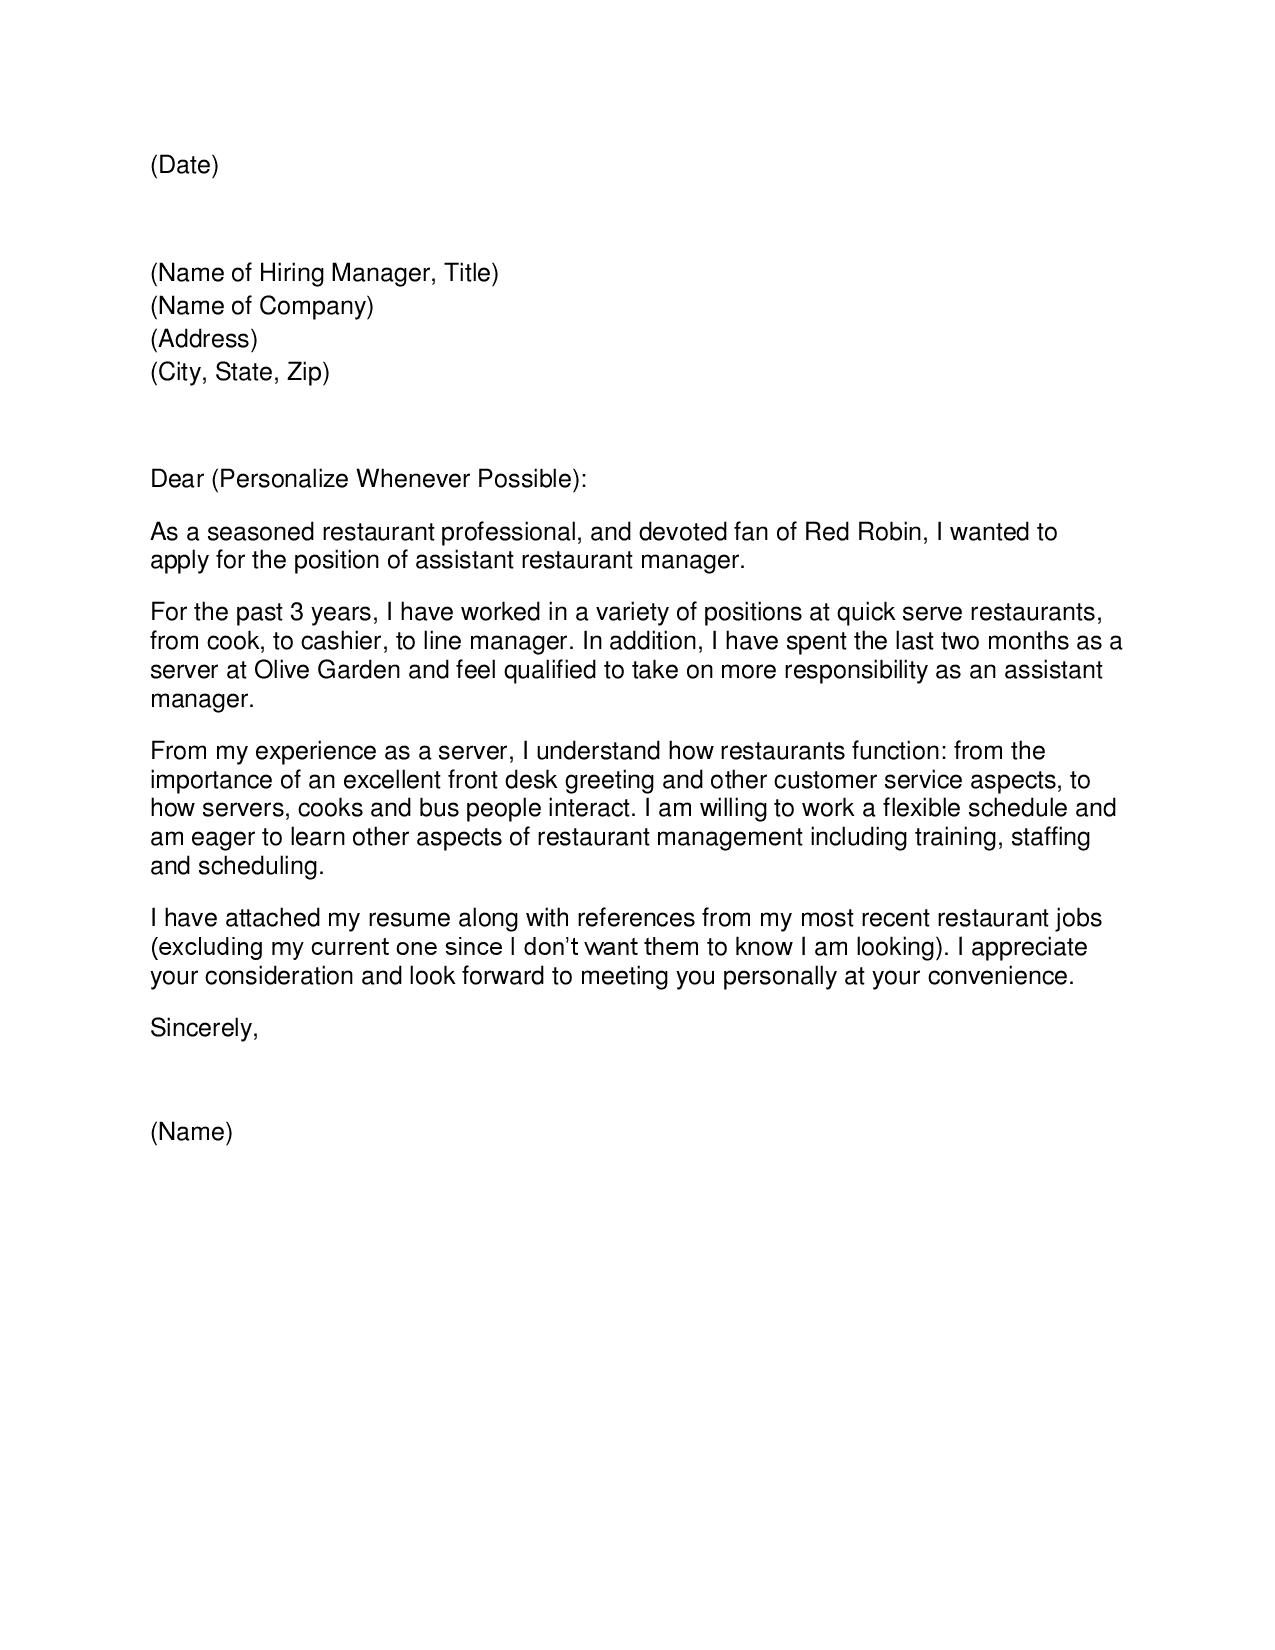 cover letter for visitor visa application new zealand